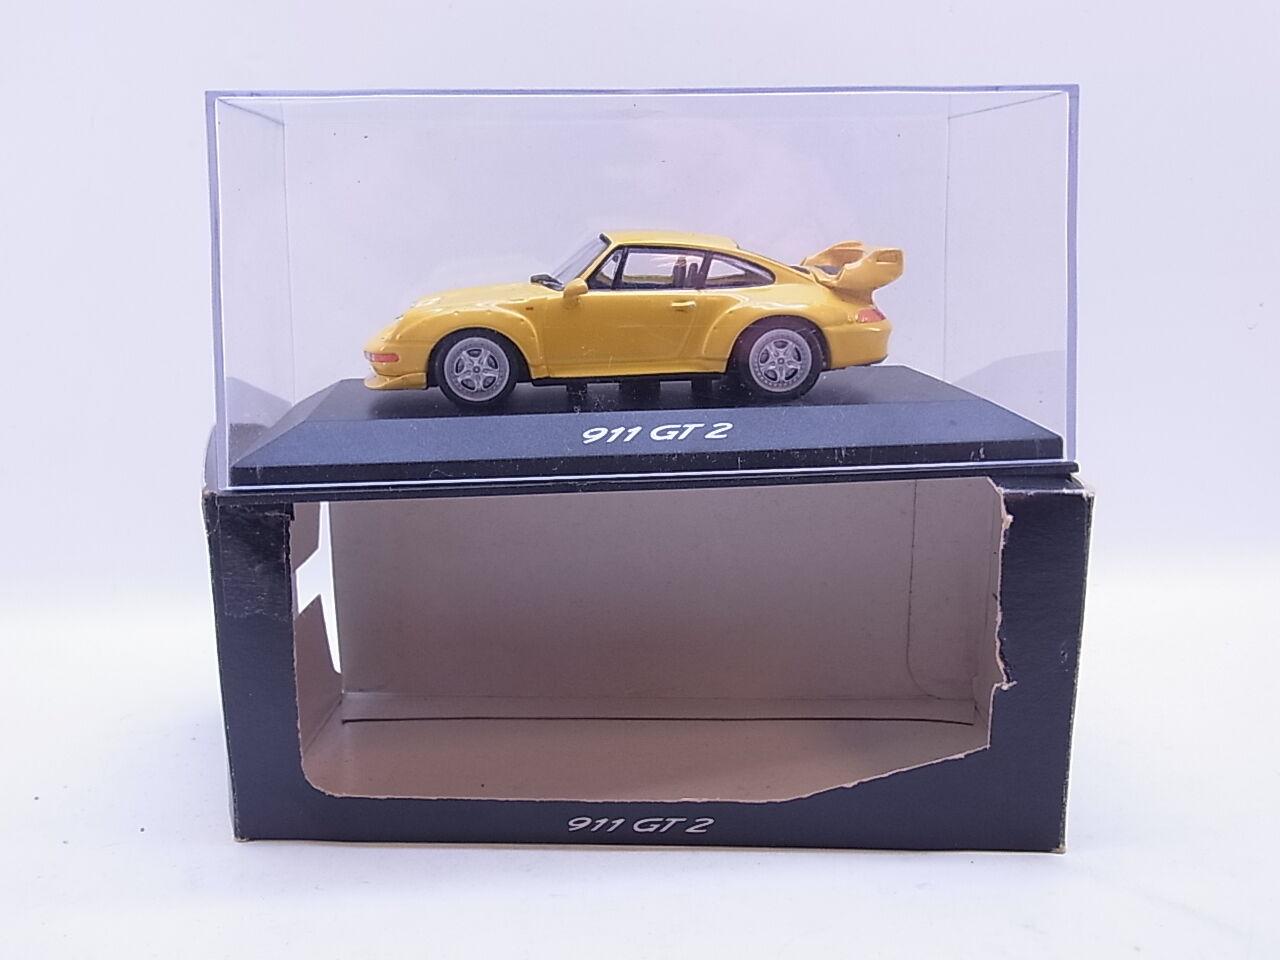 LOT 40699 Minichamps Porsche 911 GT2 Typ 993 gelb Modelauto 1 43 in OVP